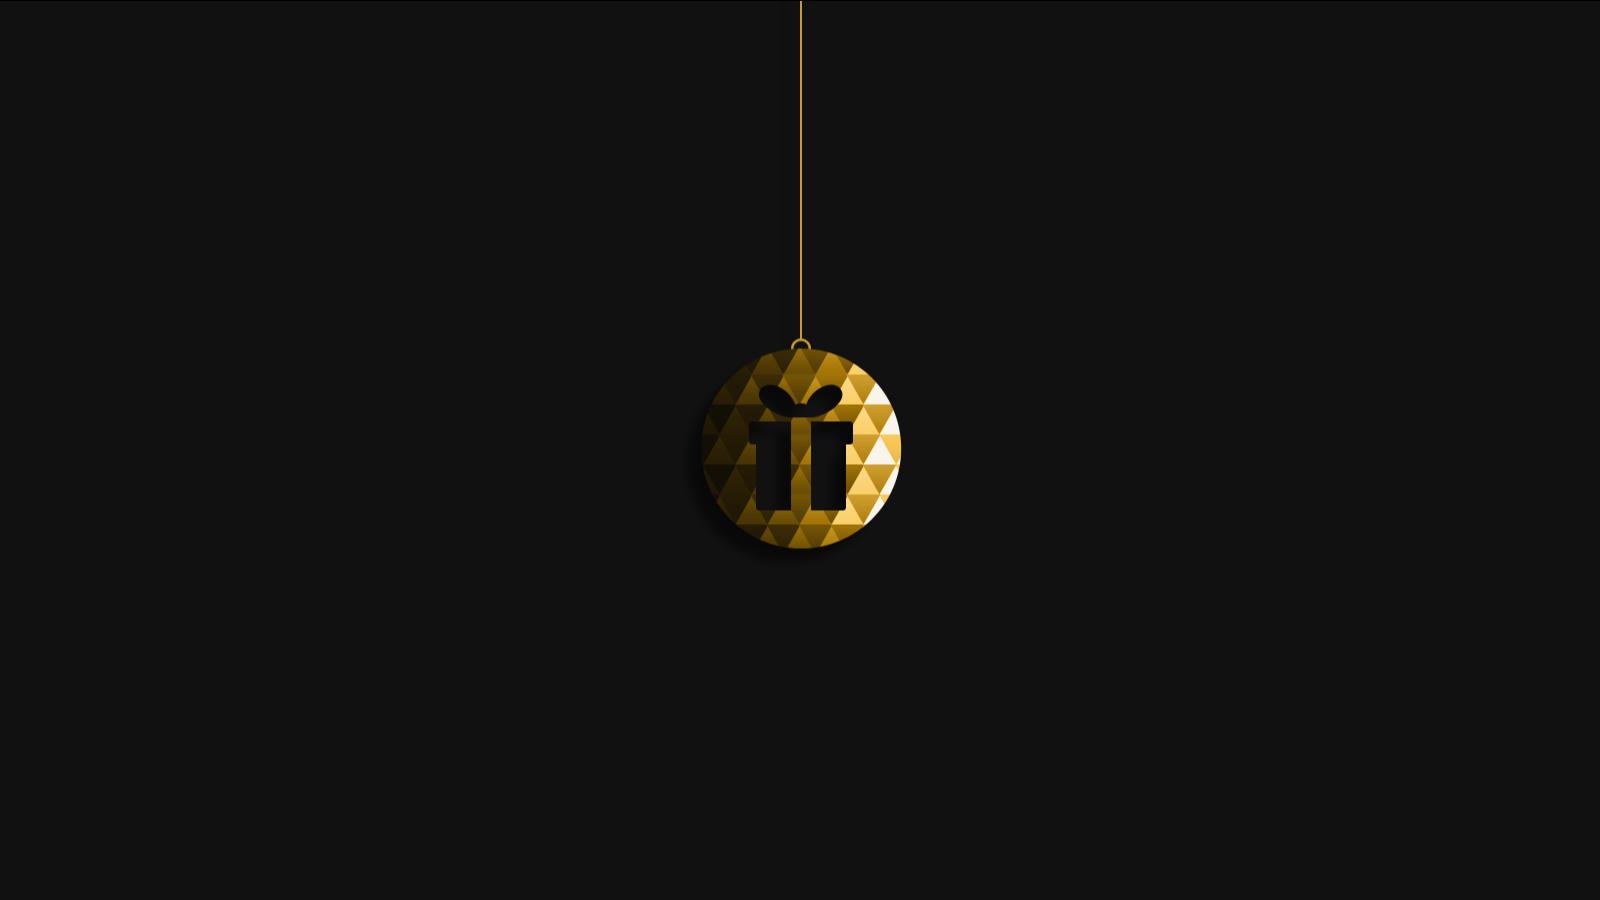 Christmas Card Elegant Lights by wall-e CodeCanyon